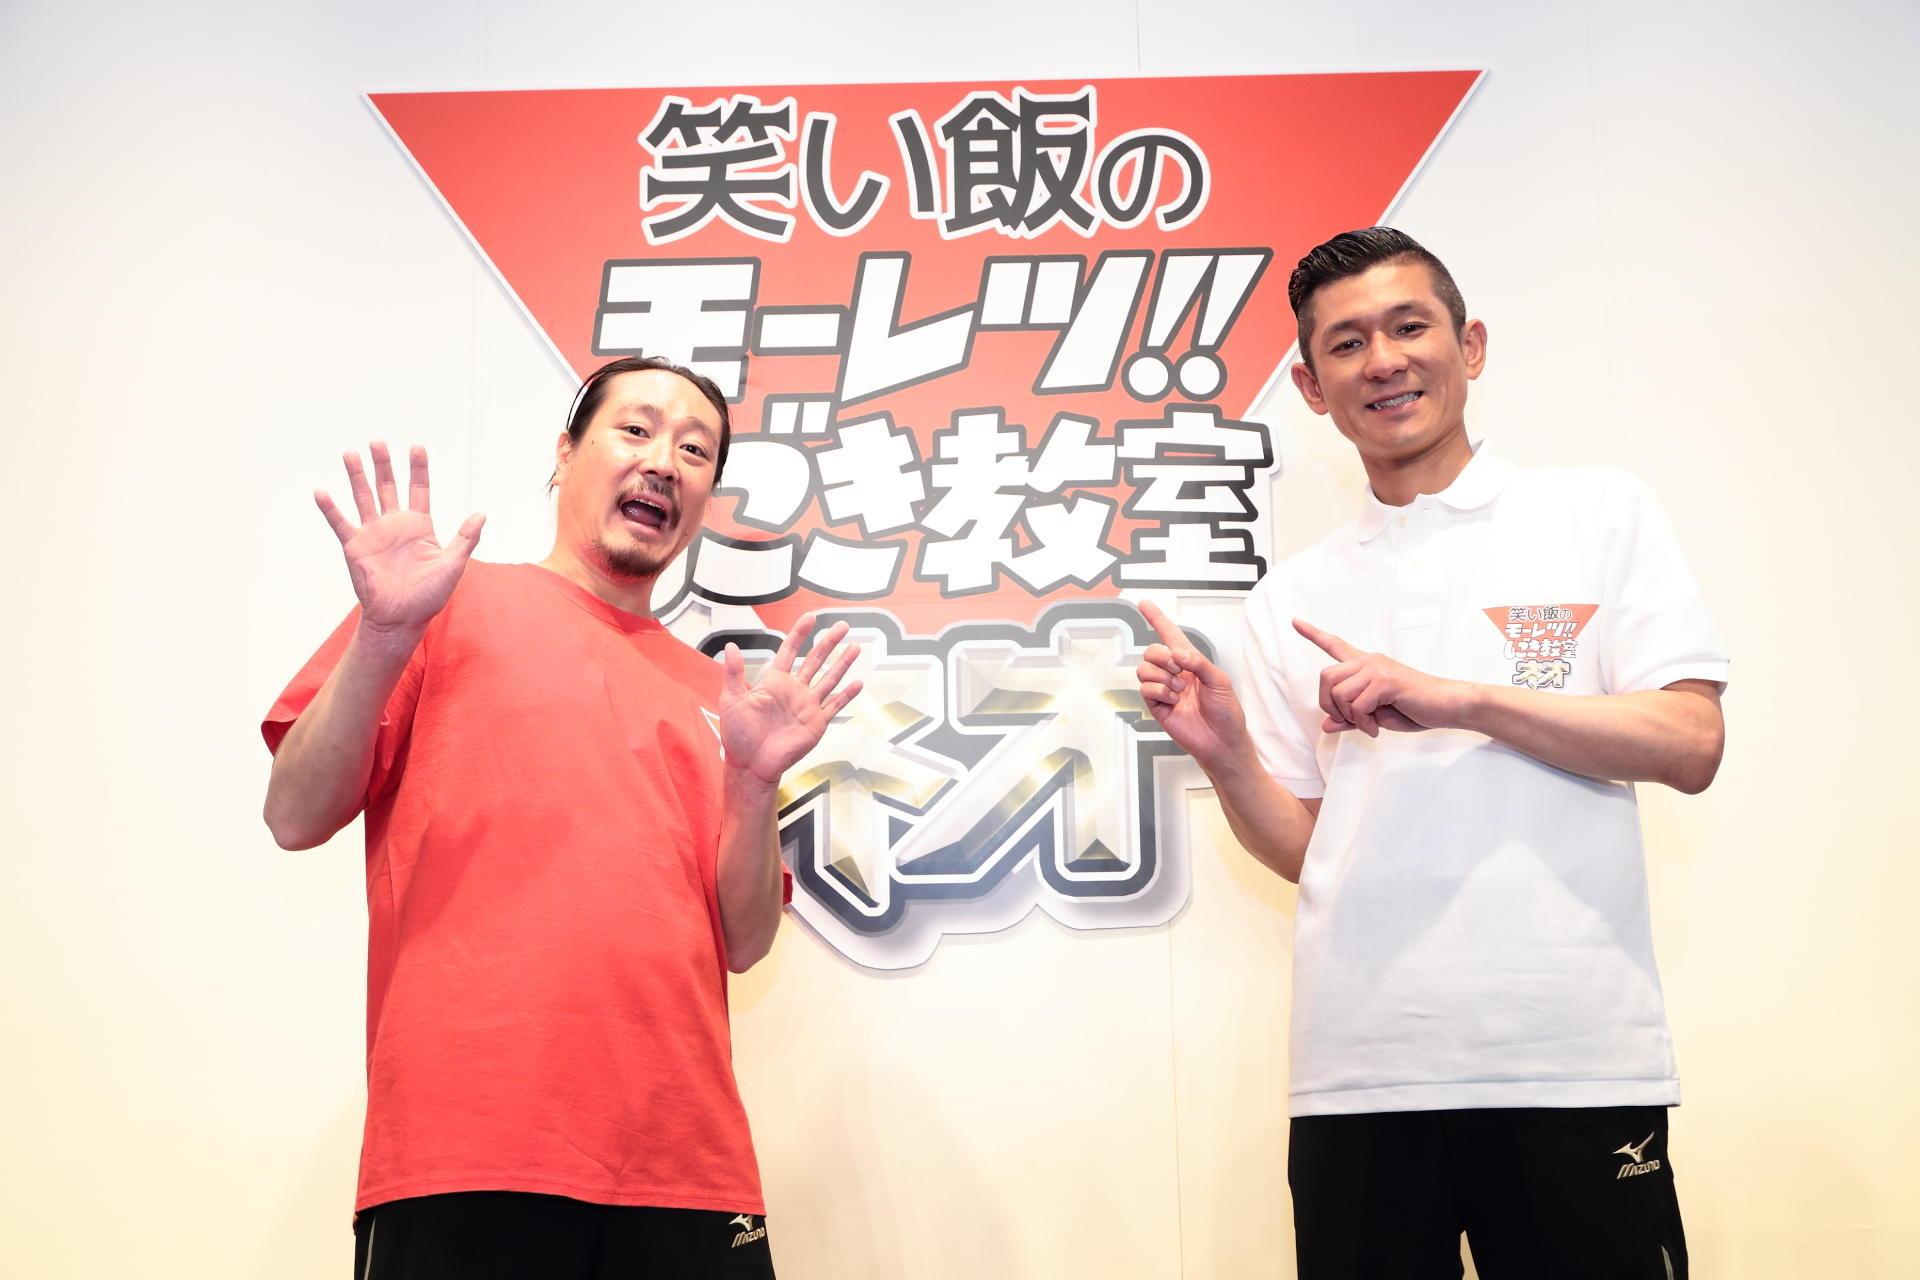 http://news.yoshimoto.co.jp/20170607215731-9d5a839799d0605baab5cf2fa38aef77714c4d29.jpg